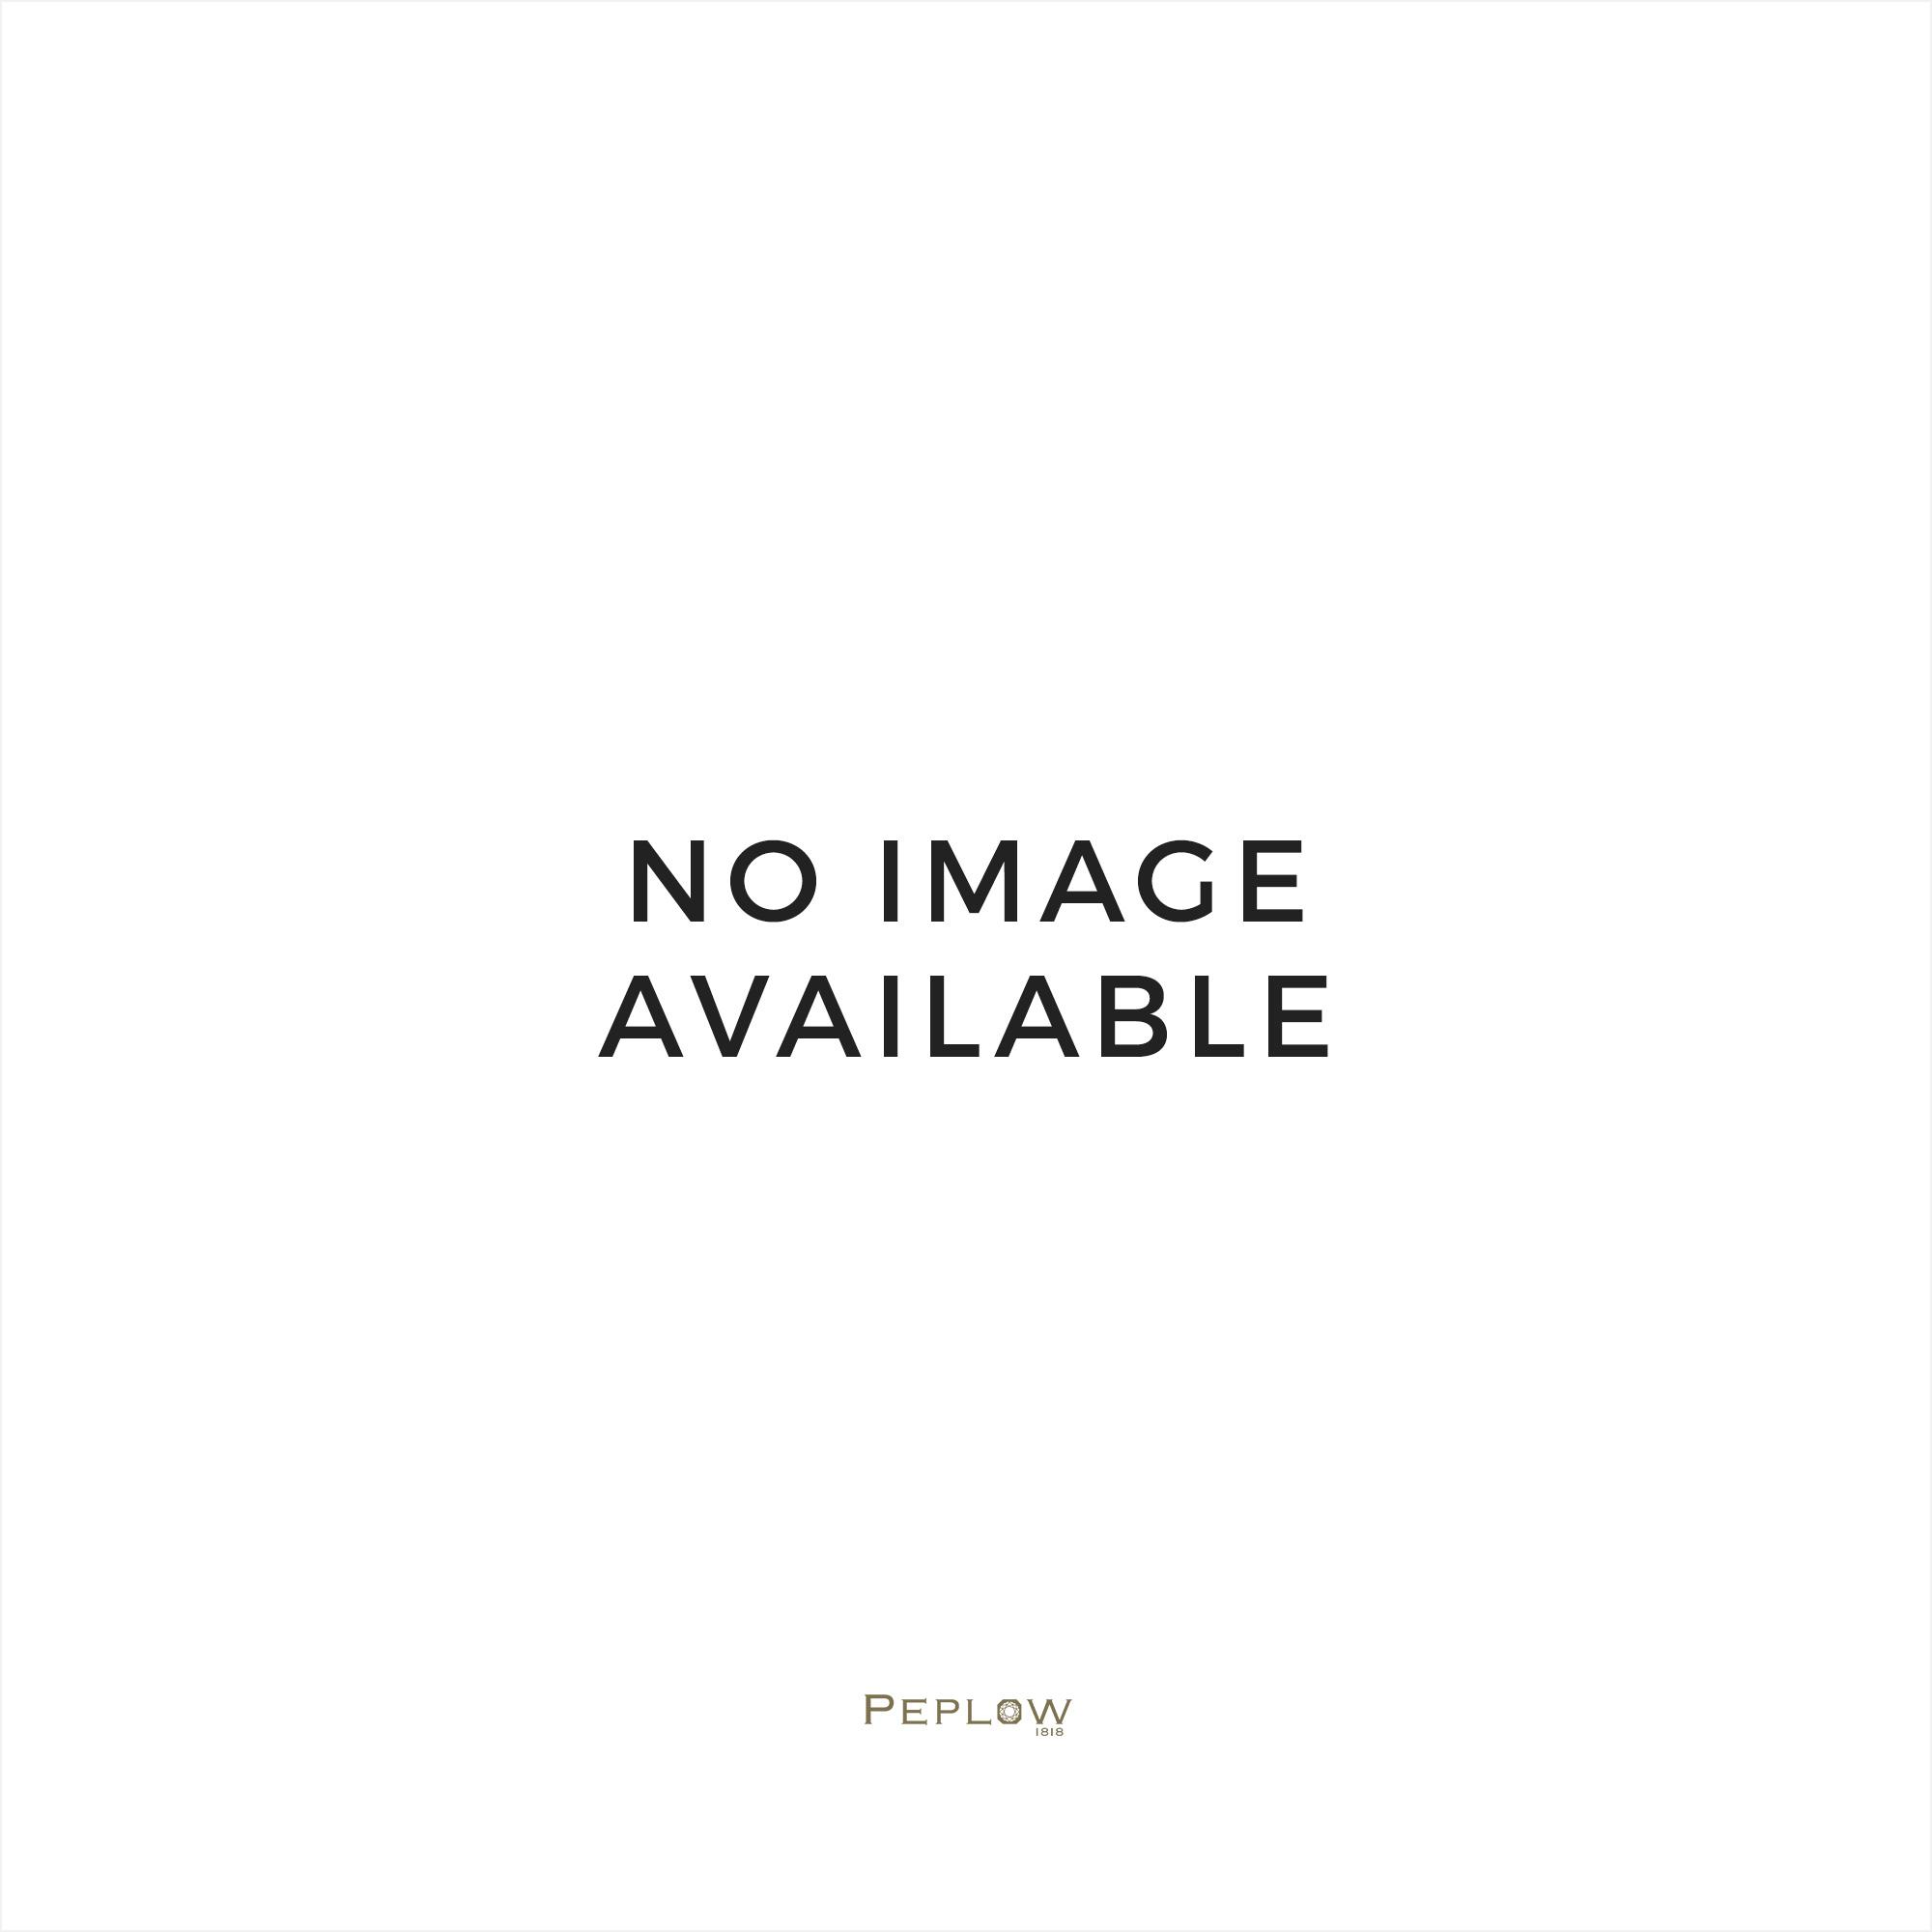 Royal Selangor Pewter Hansel and Gretel coin box, 016529R